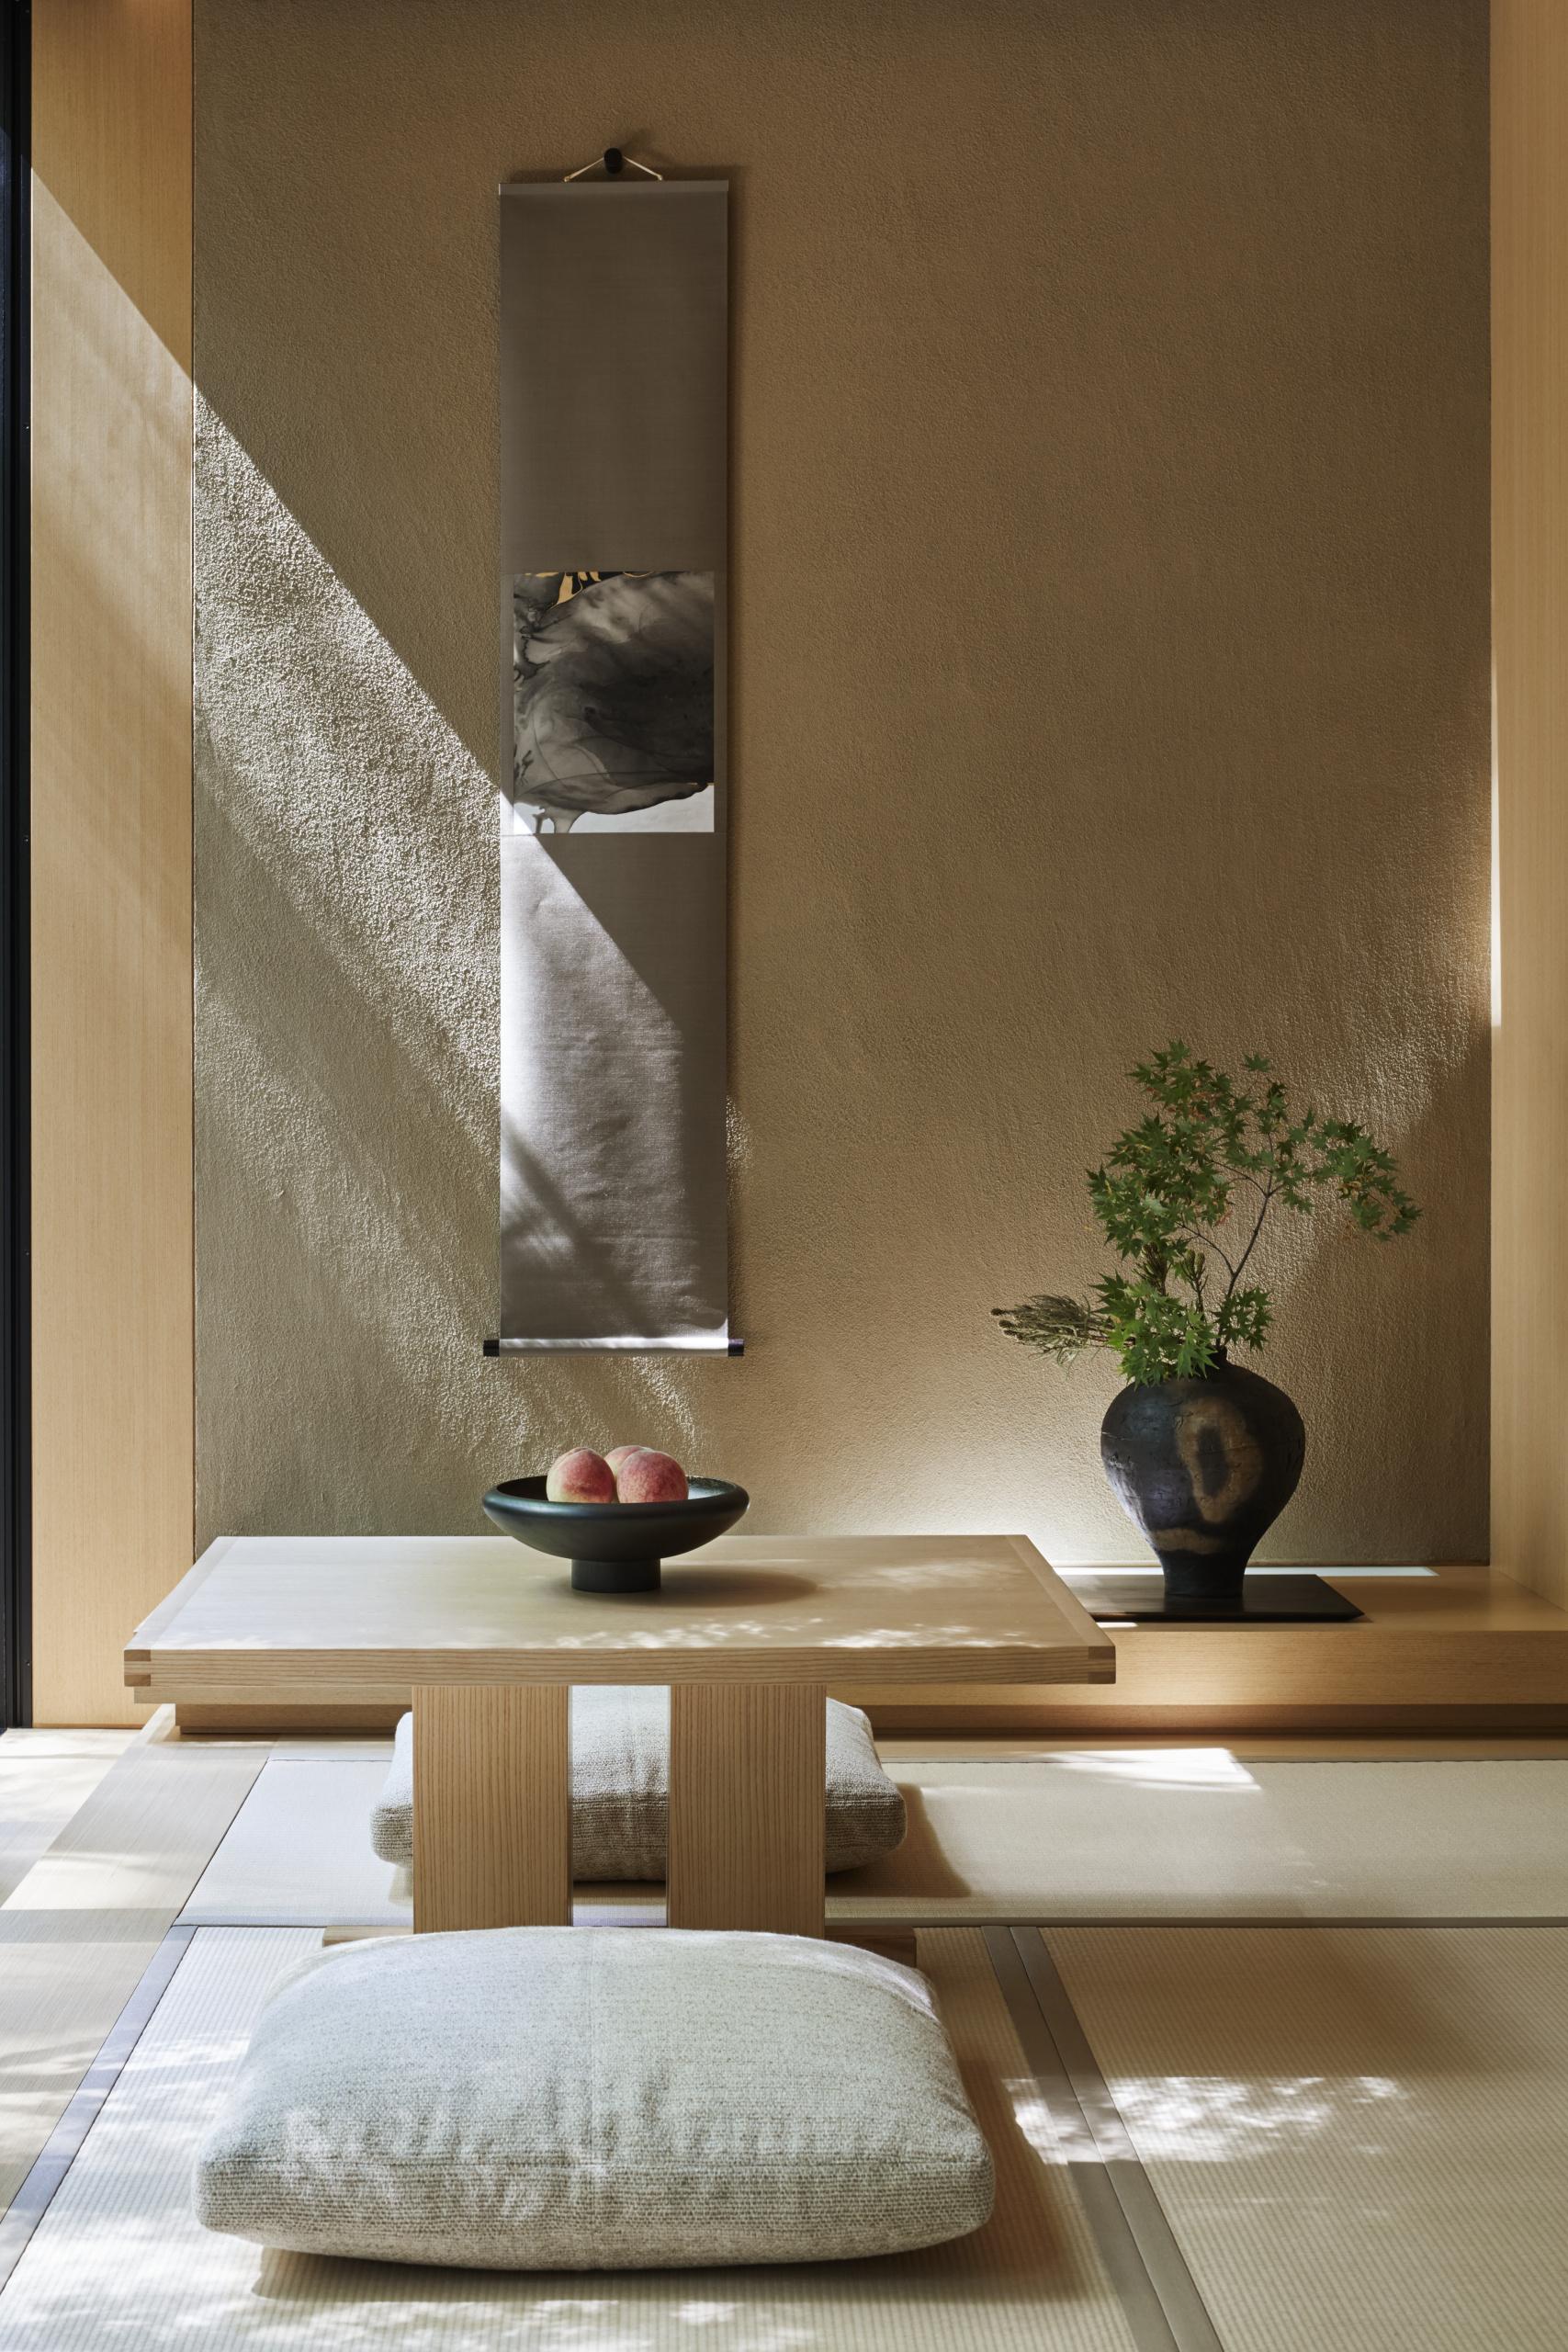 Aman Kyoto, Amanemu, Kinkaku-ji Temple,